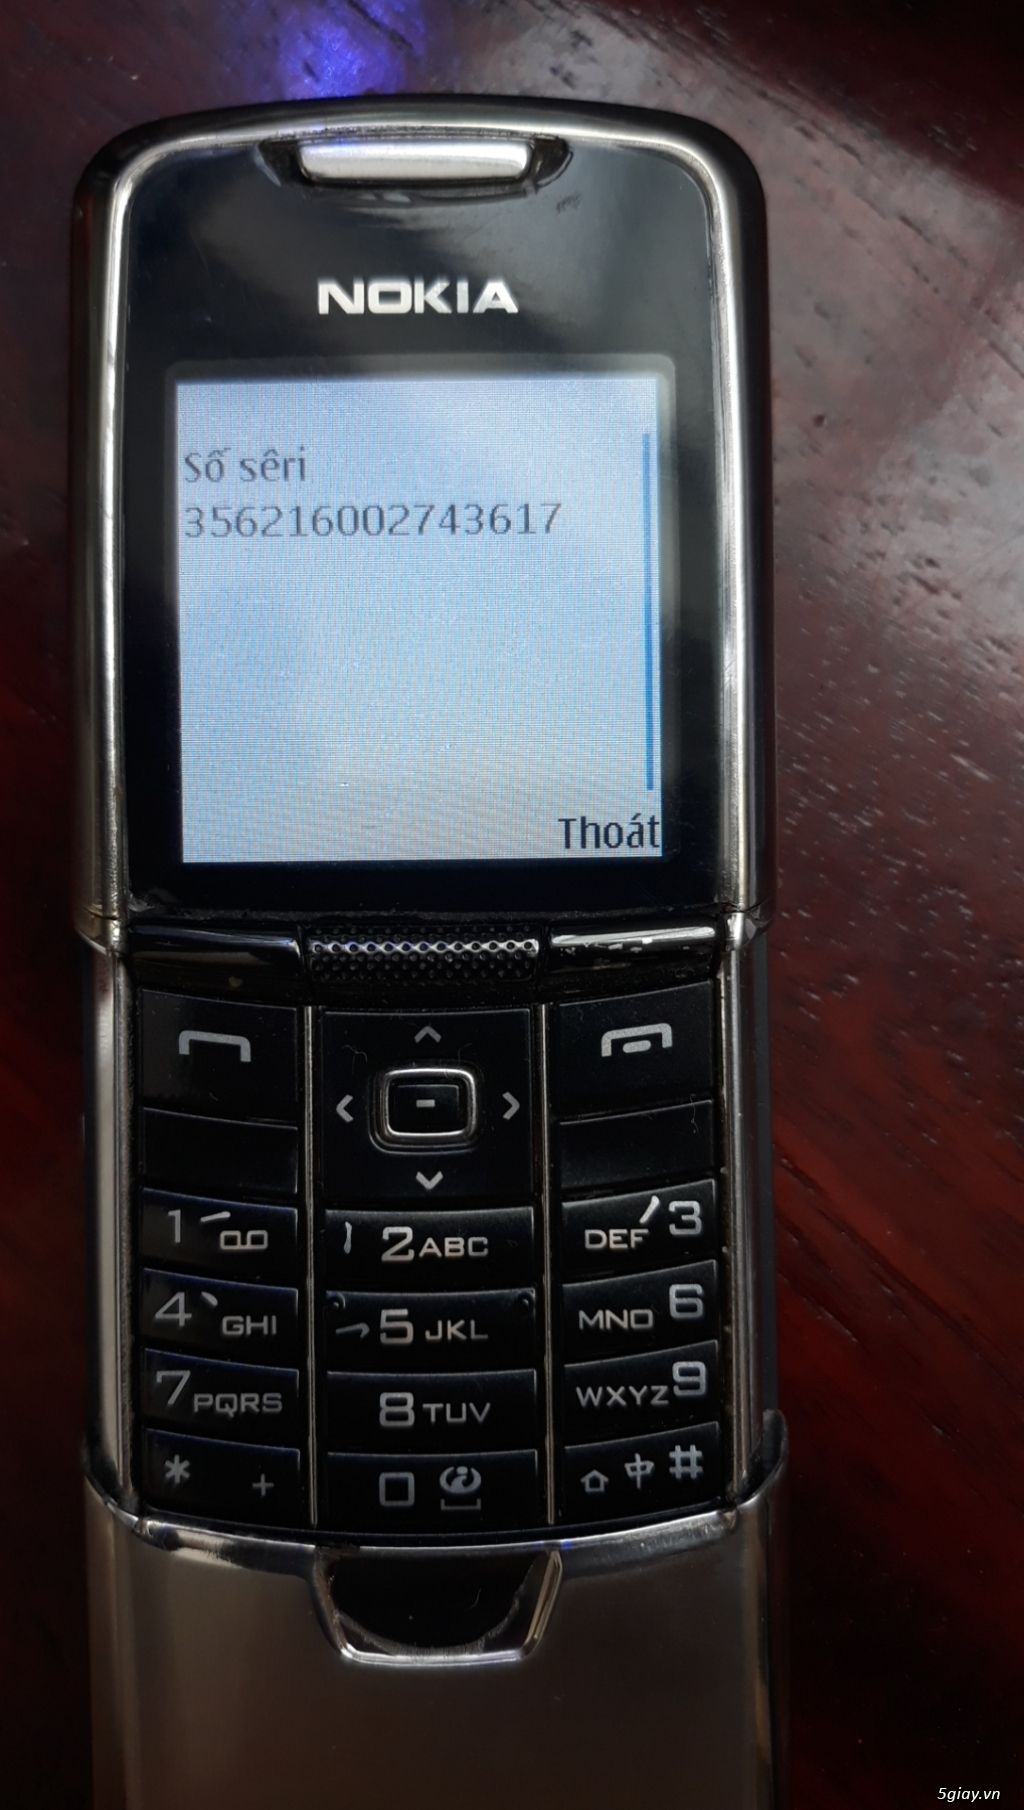 Nokia 8800 Vang danh một thời. - 2